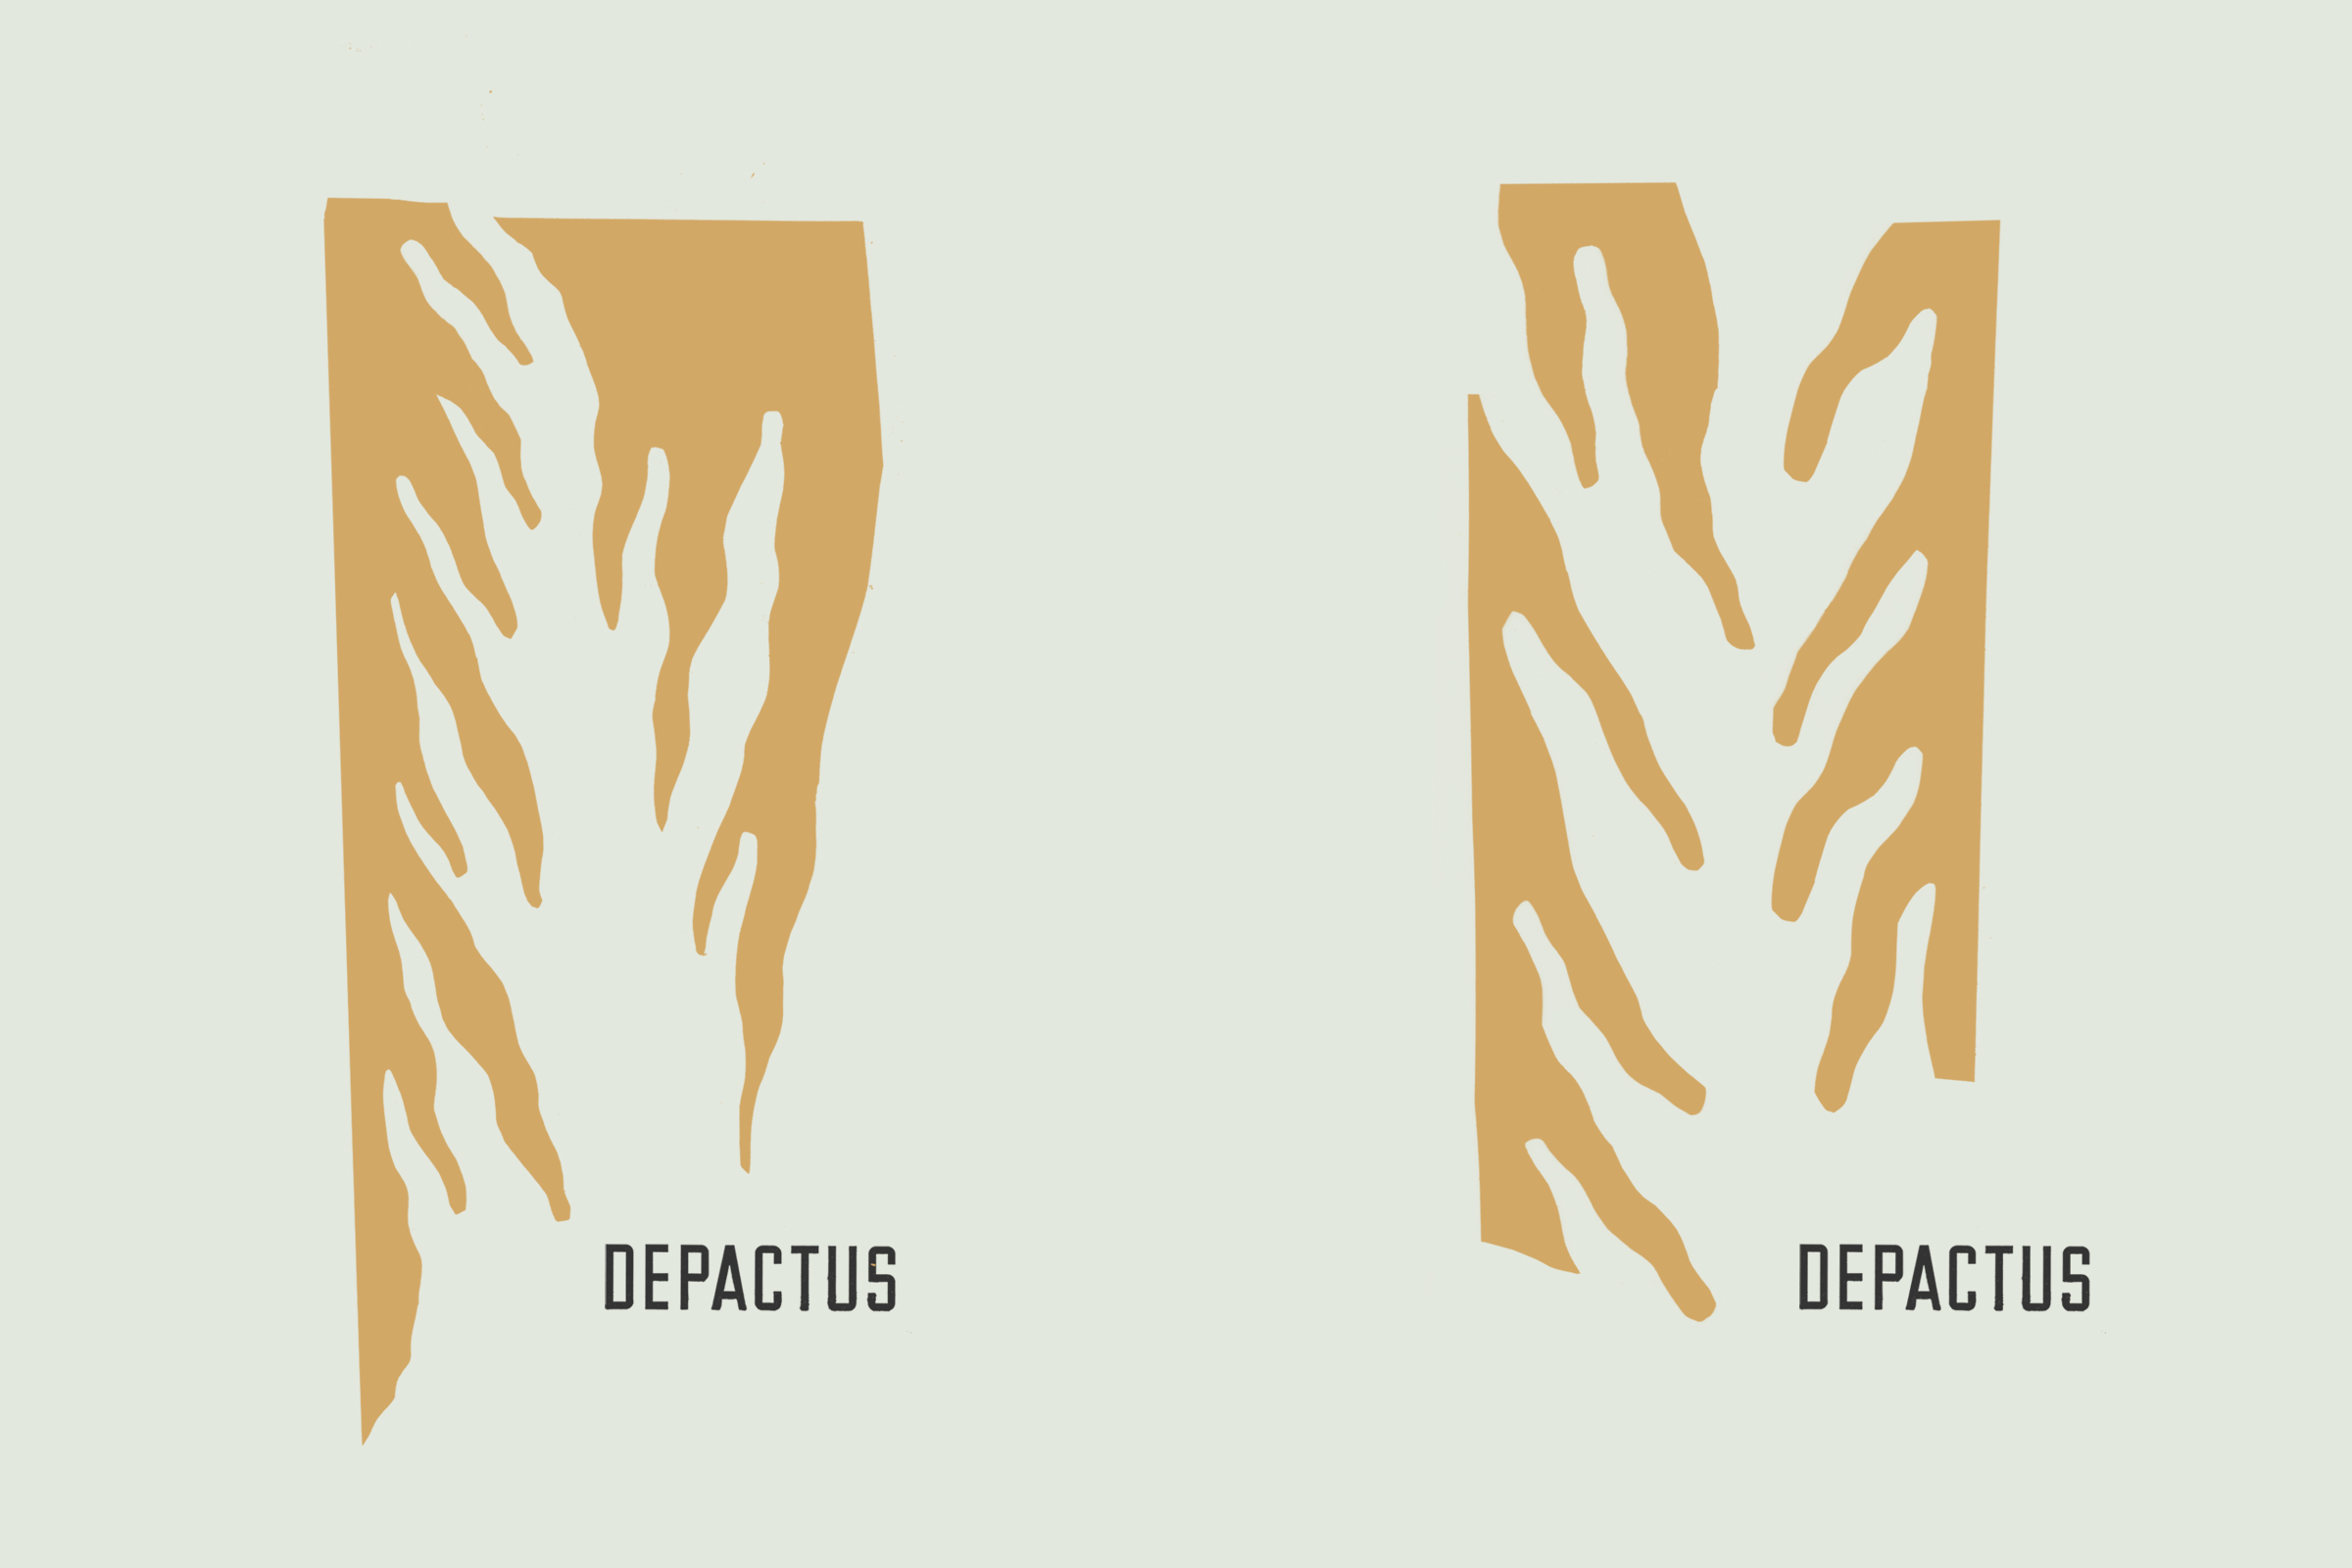 Depactus_Branding_McQuade_Design_5.jpg